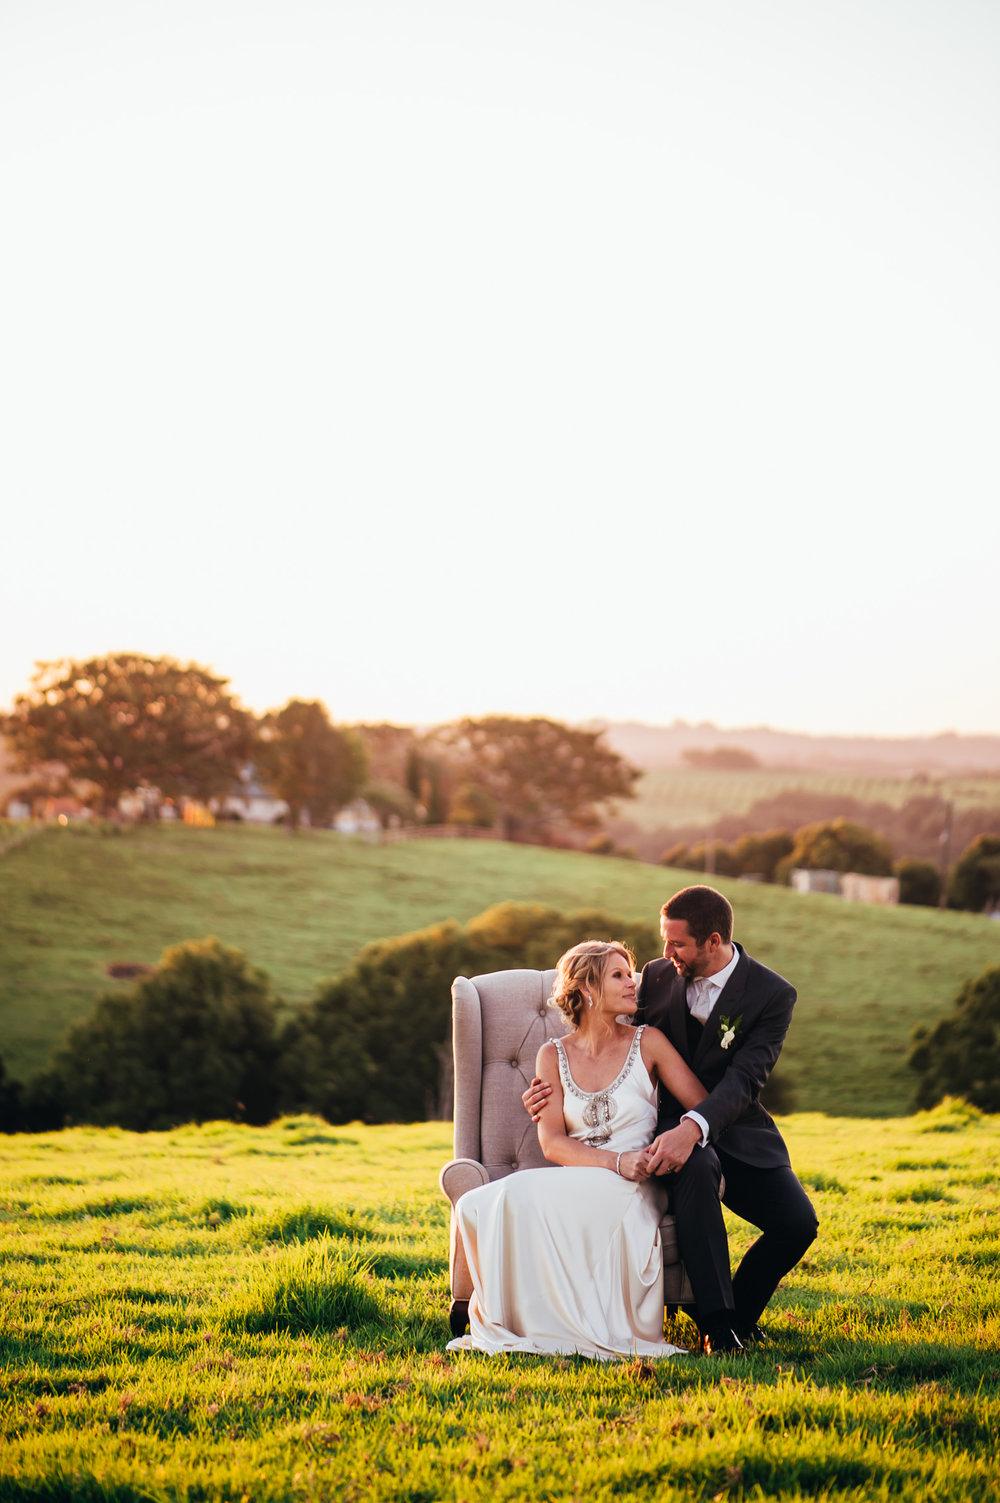 Byron_View_Wedding_Venue-48.jpg